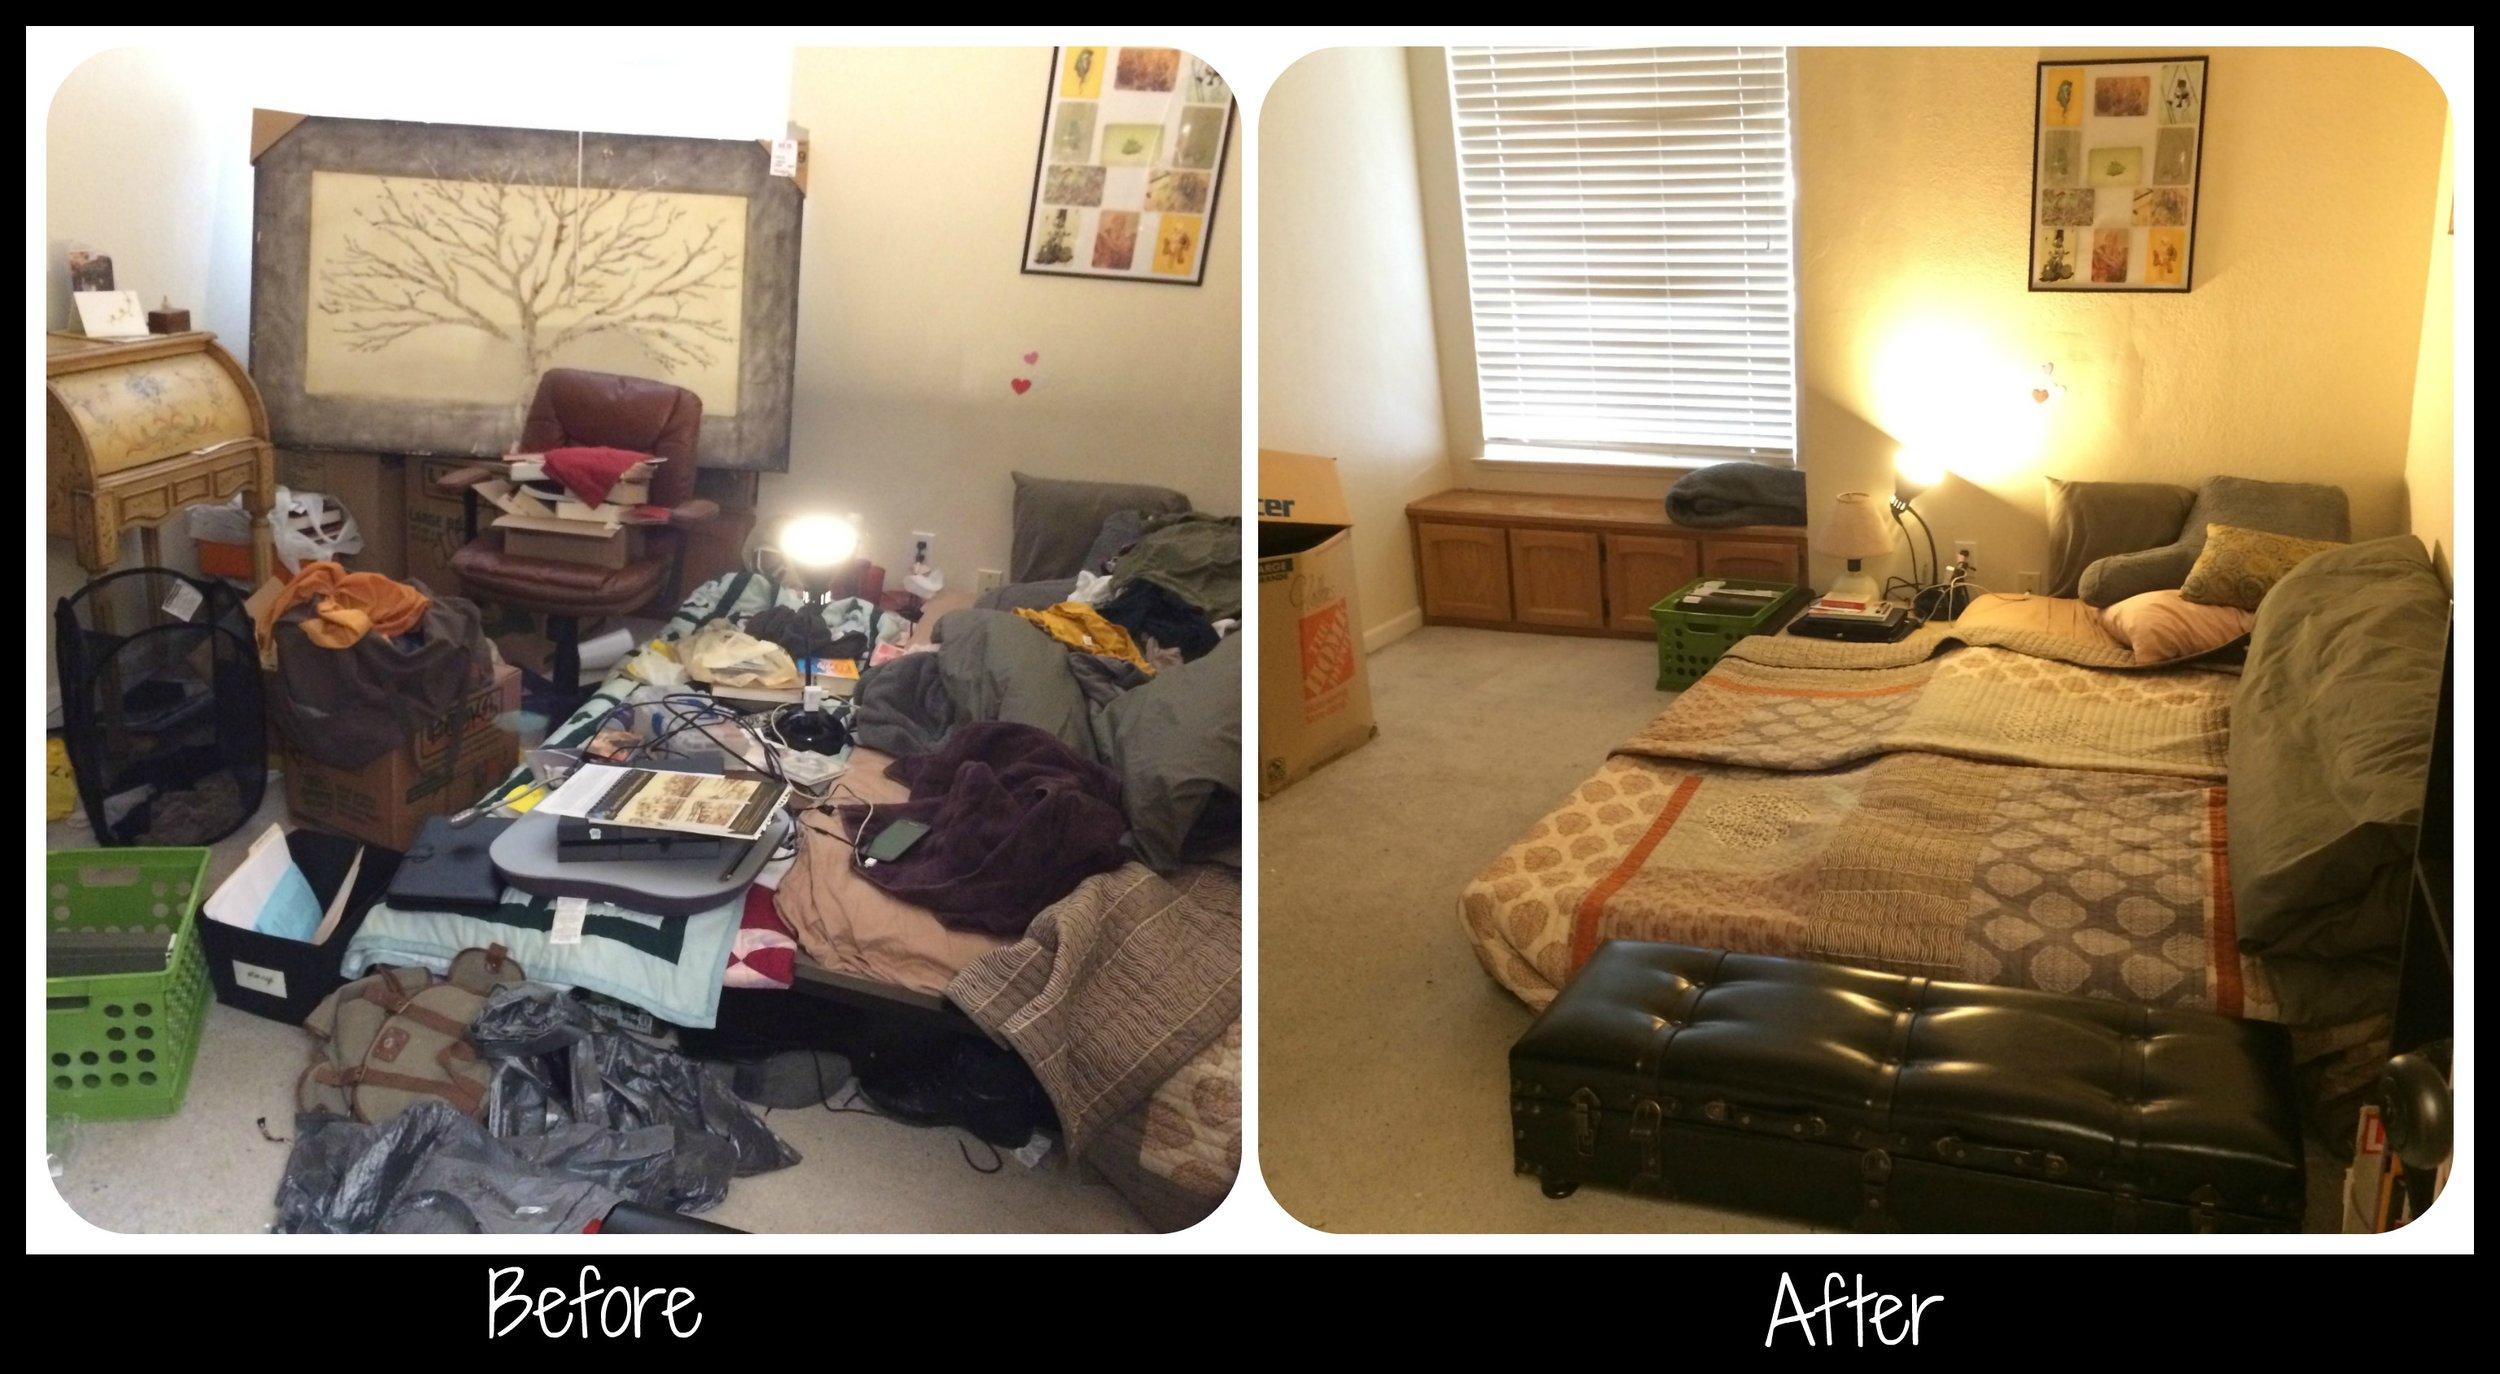 1.19 Bedroom Before.After copy.jpg